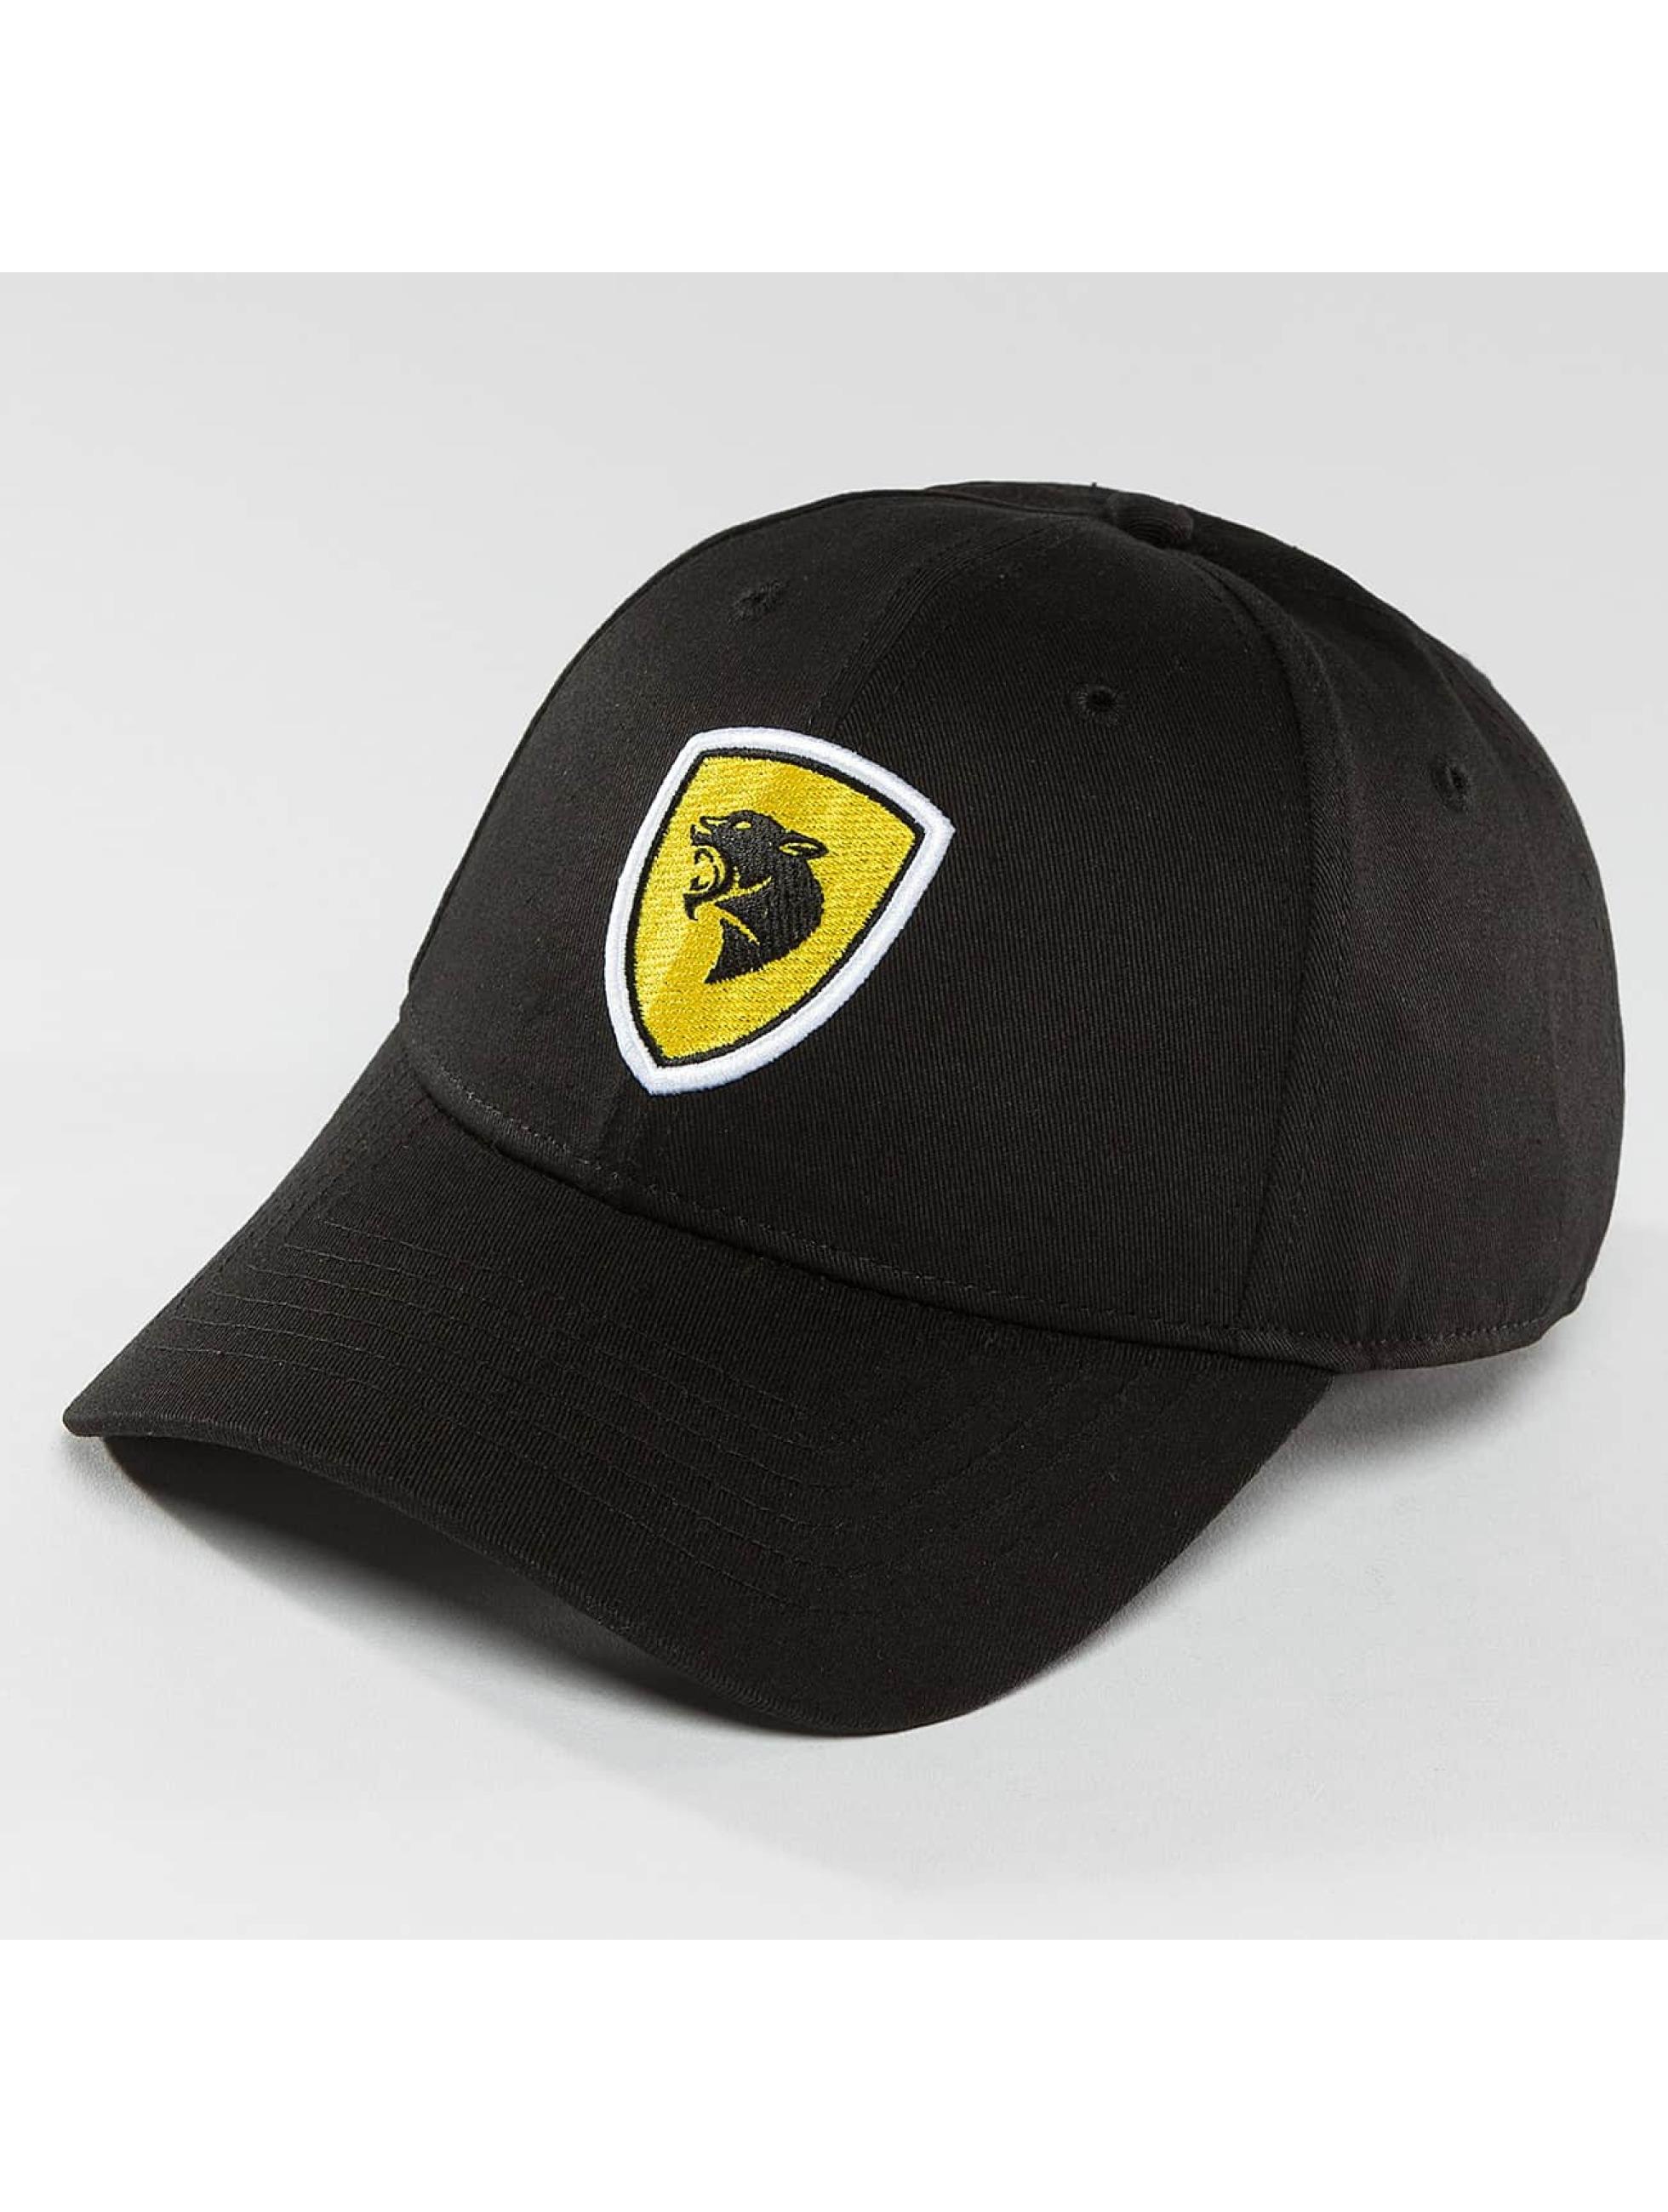 Unkut Männer,Frauen Snapback Cap F1 in schwarz